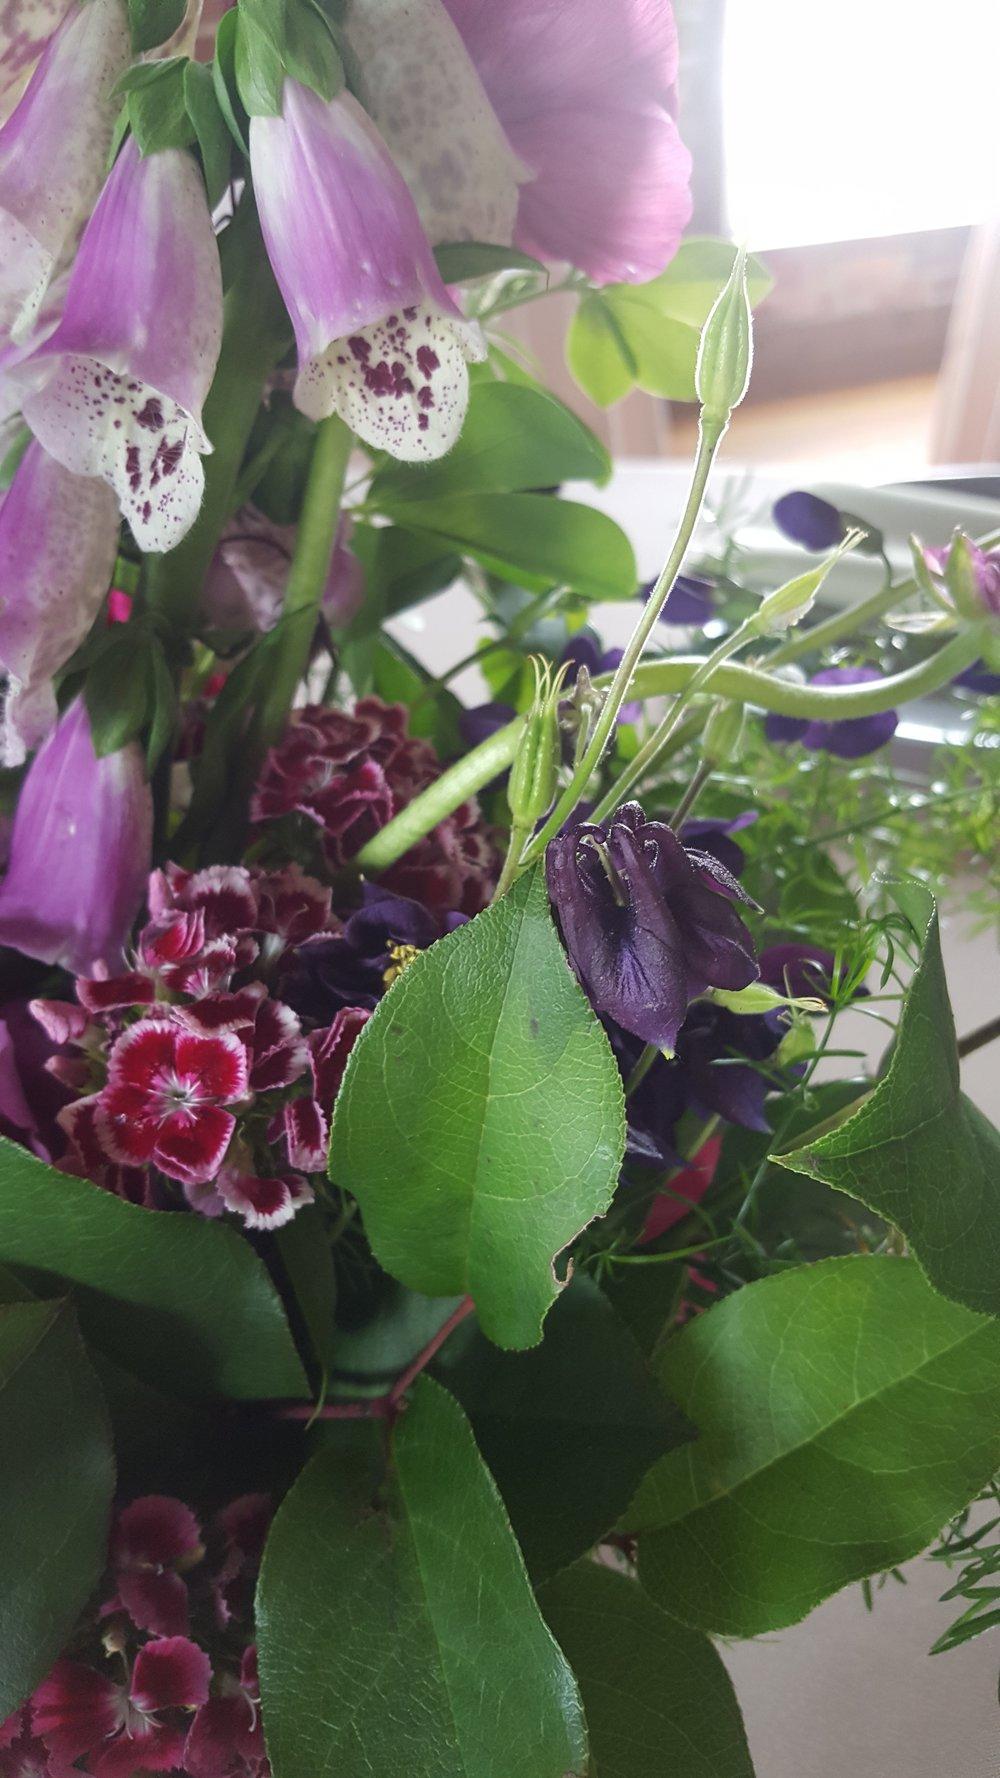 wildflowers foxglove columbine